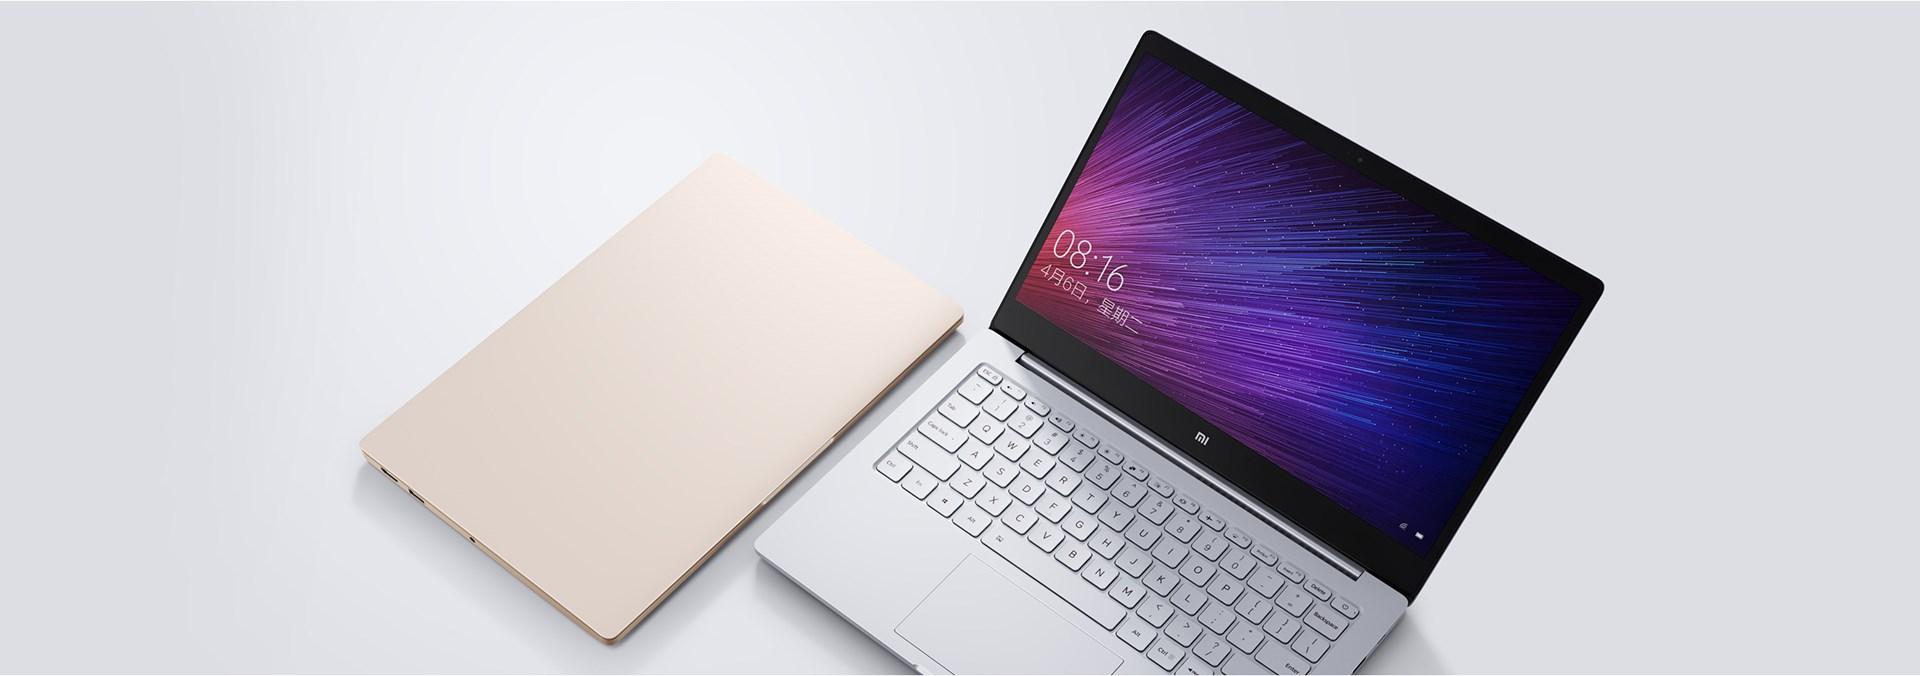 Xiaomi anuncia seus ultrabooks acessíveis